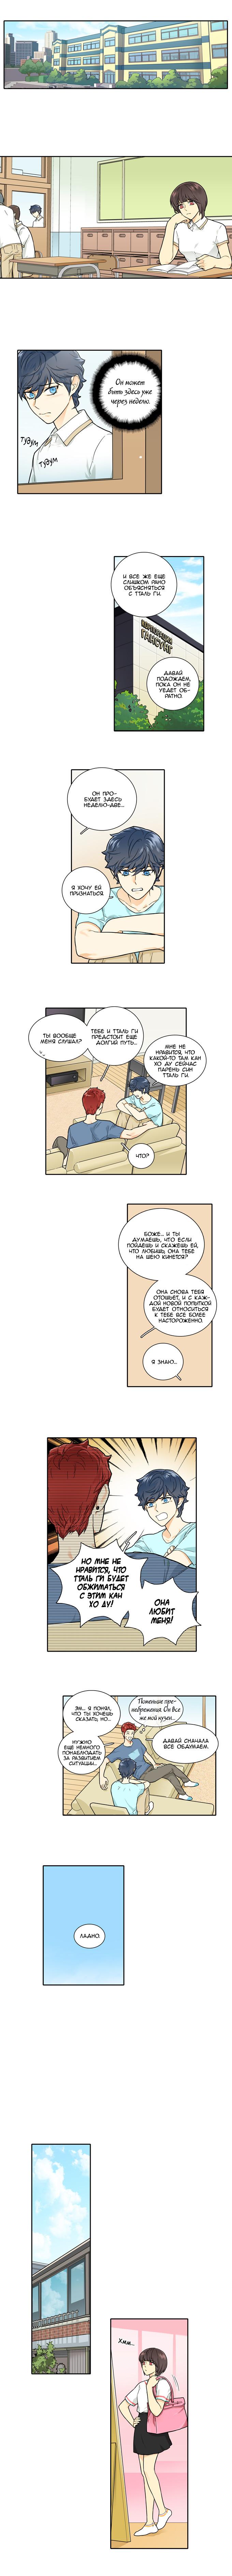 https://r1.ninemanga.com/comics/pic2/41/21609/305038/1467753844738.jpg Page 4